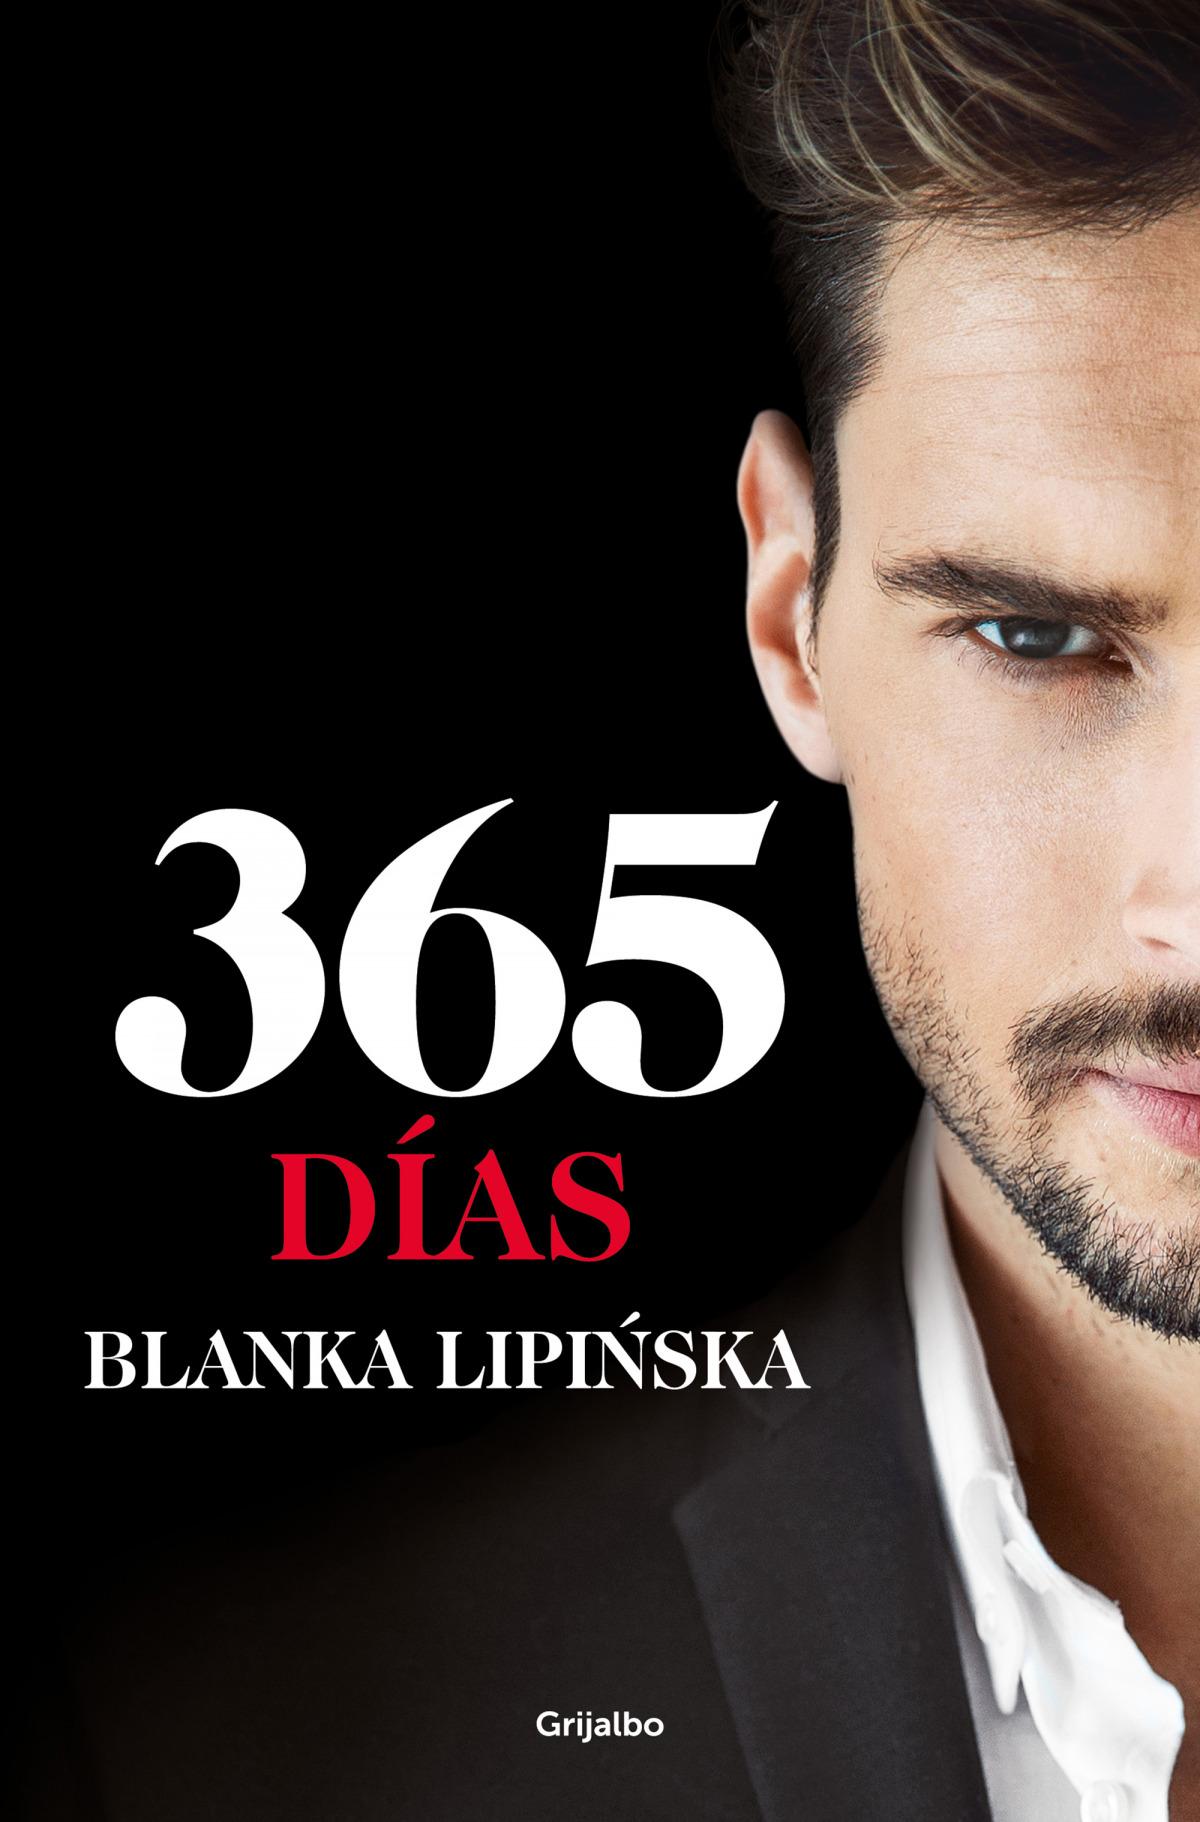 365 d¡as (®Trilog¡a 365 d¡as¯) 9788425360589